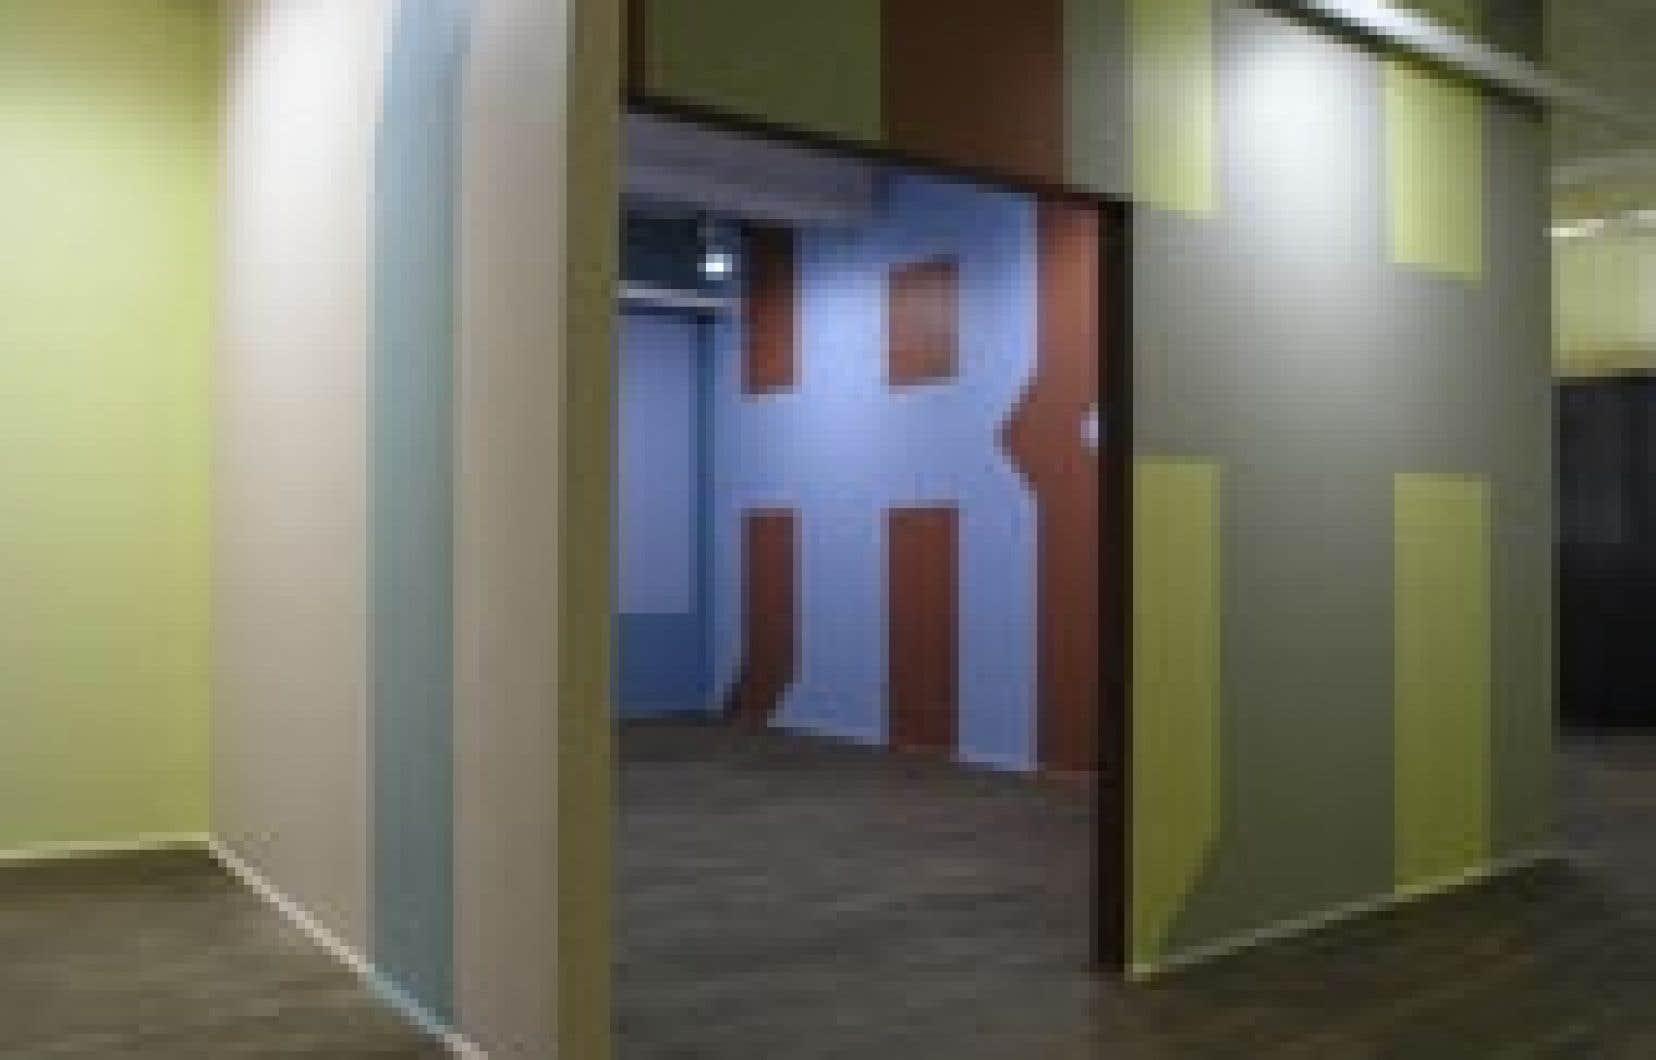 Exposition You scratch my back and I'll scratch your's in the colonial room, de Garry Neill Kennedy, présentée à la galerie Articule en 2004.